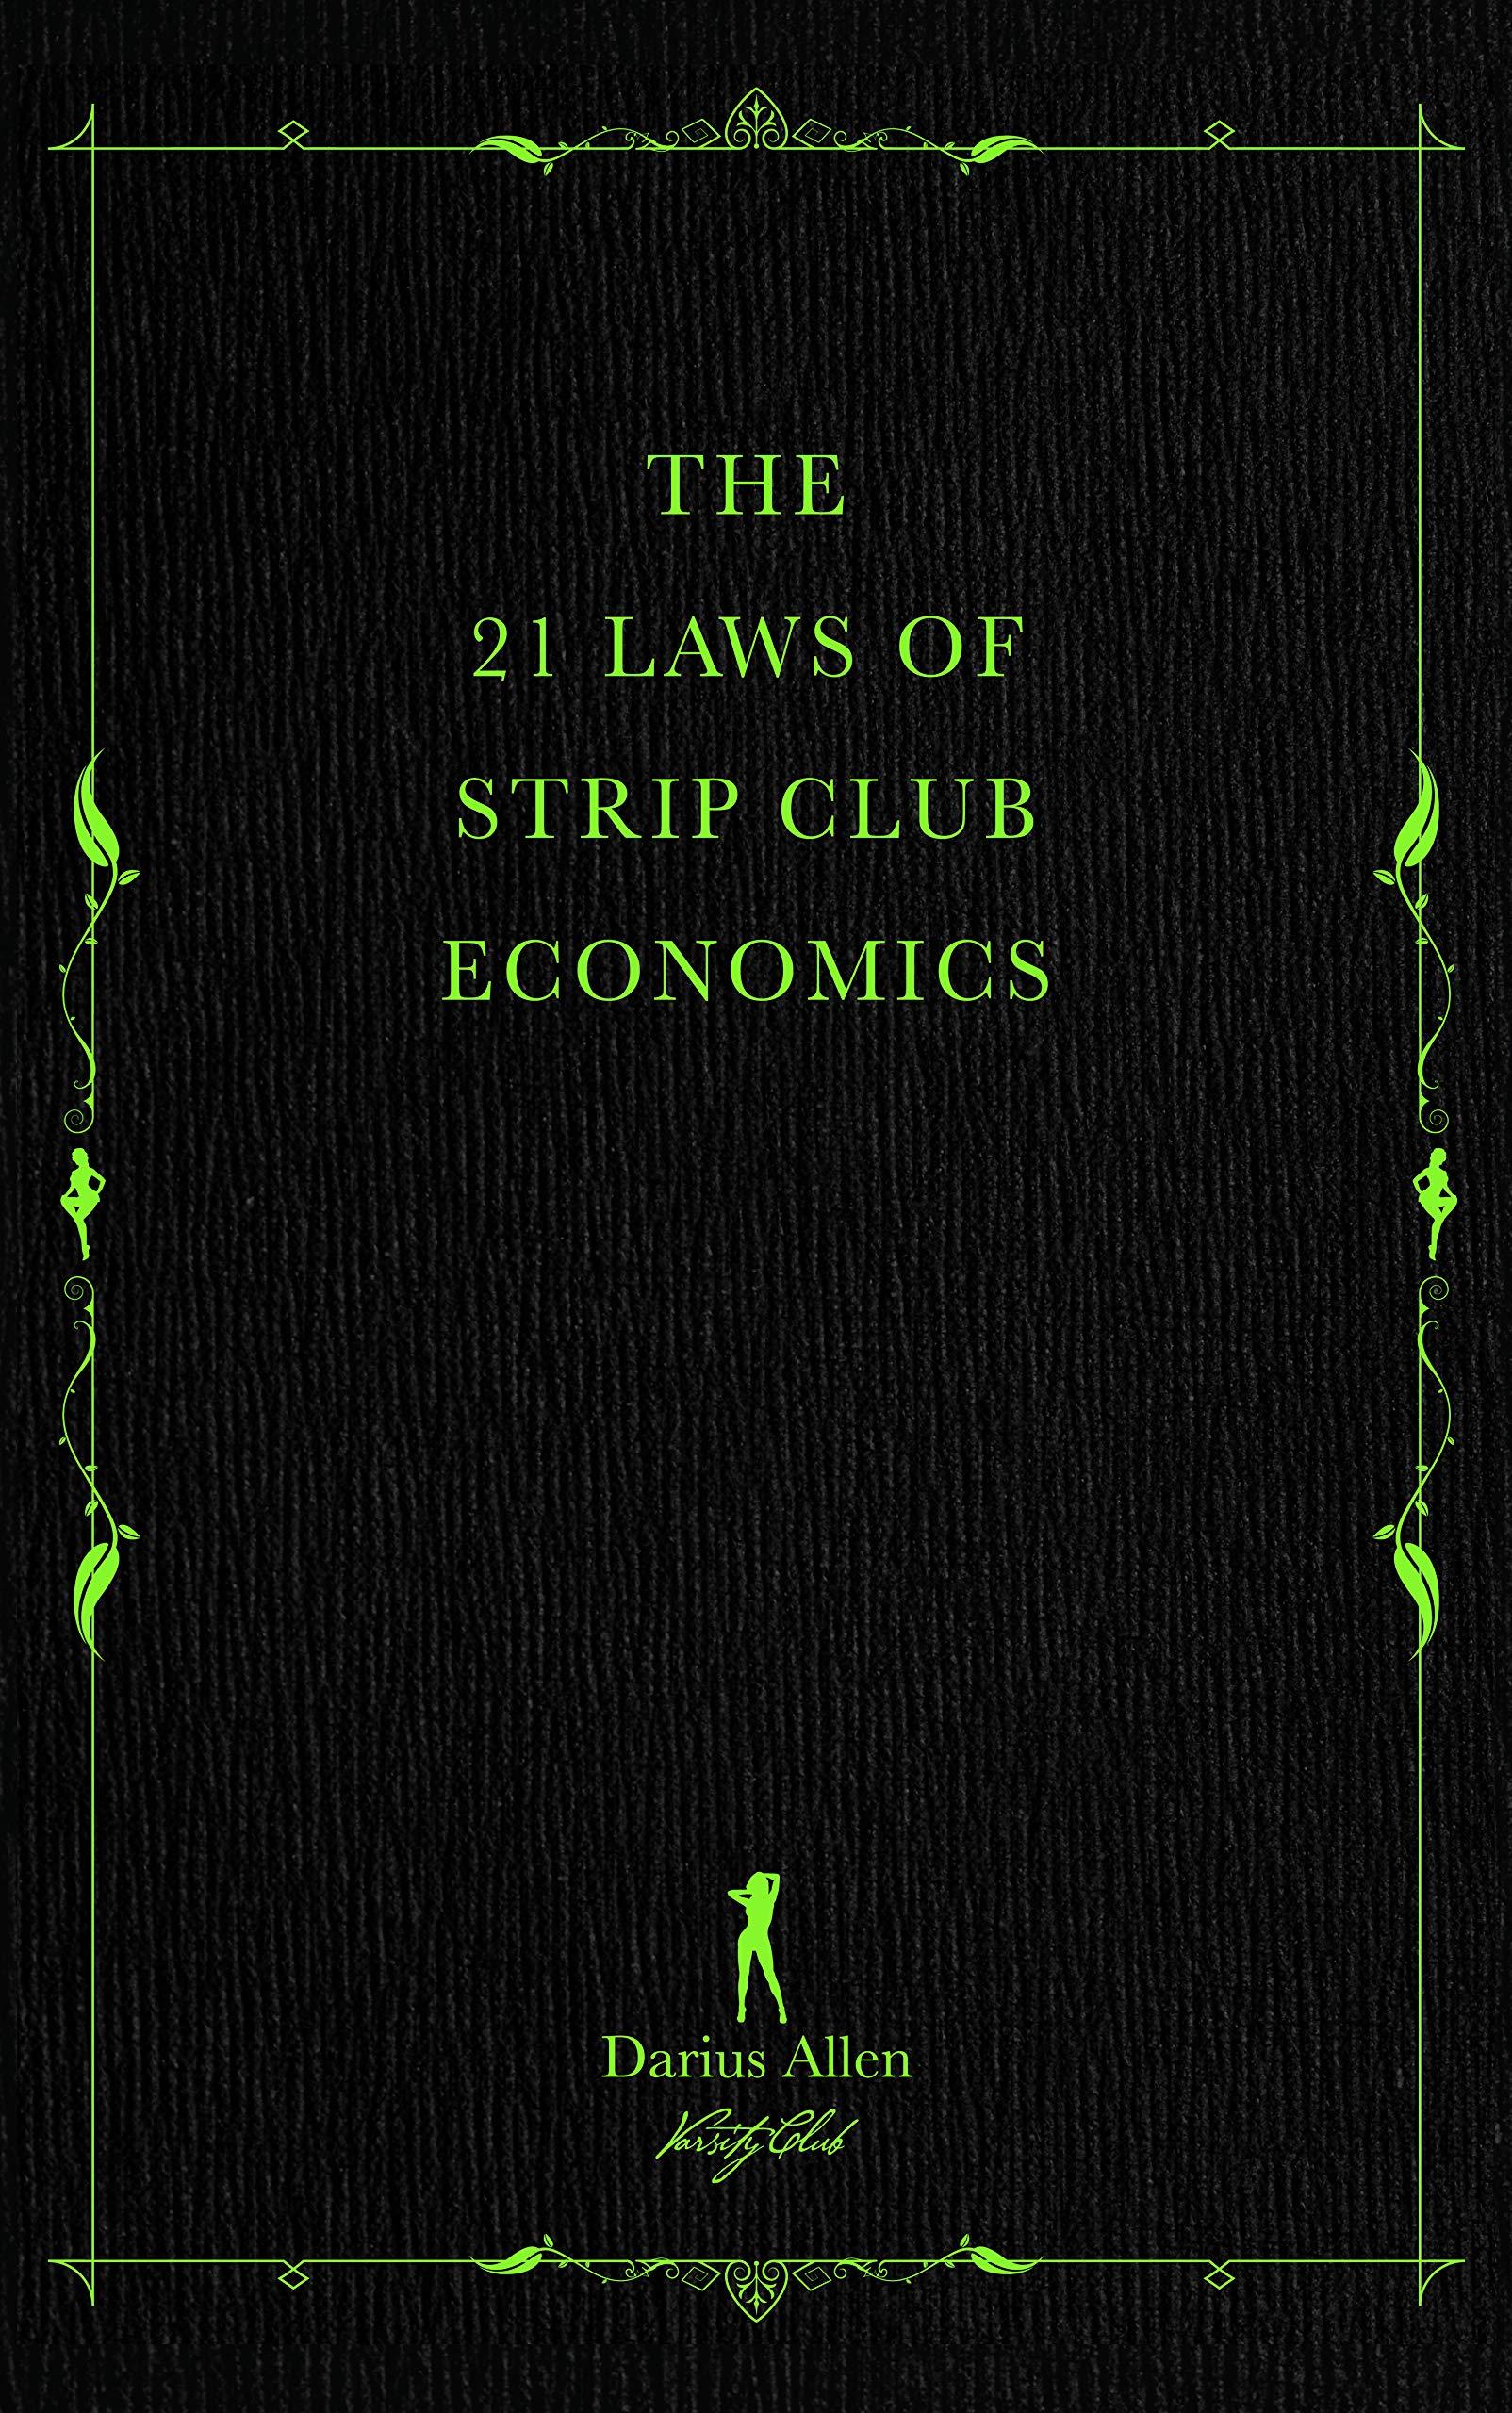 The 21 Laws of Strip Club Economics